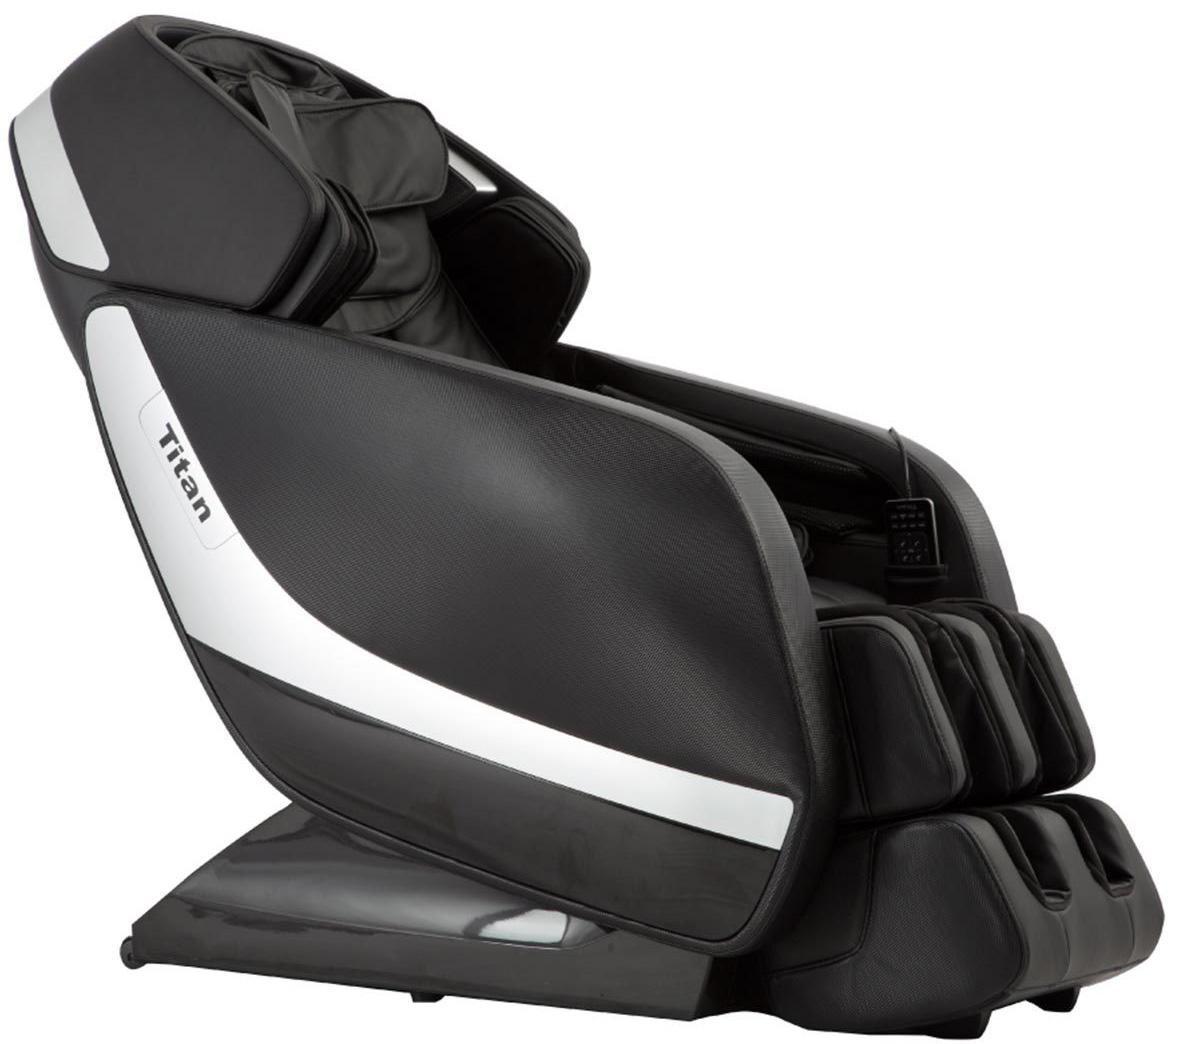 Titan Pro Jupiter XL L Track Zero Gravity Massage Chair Recliner